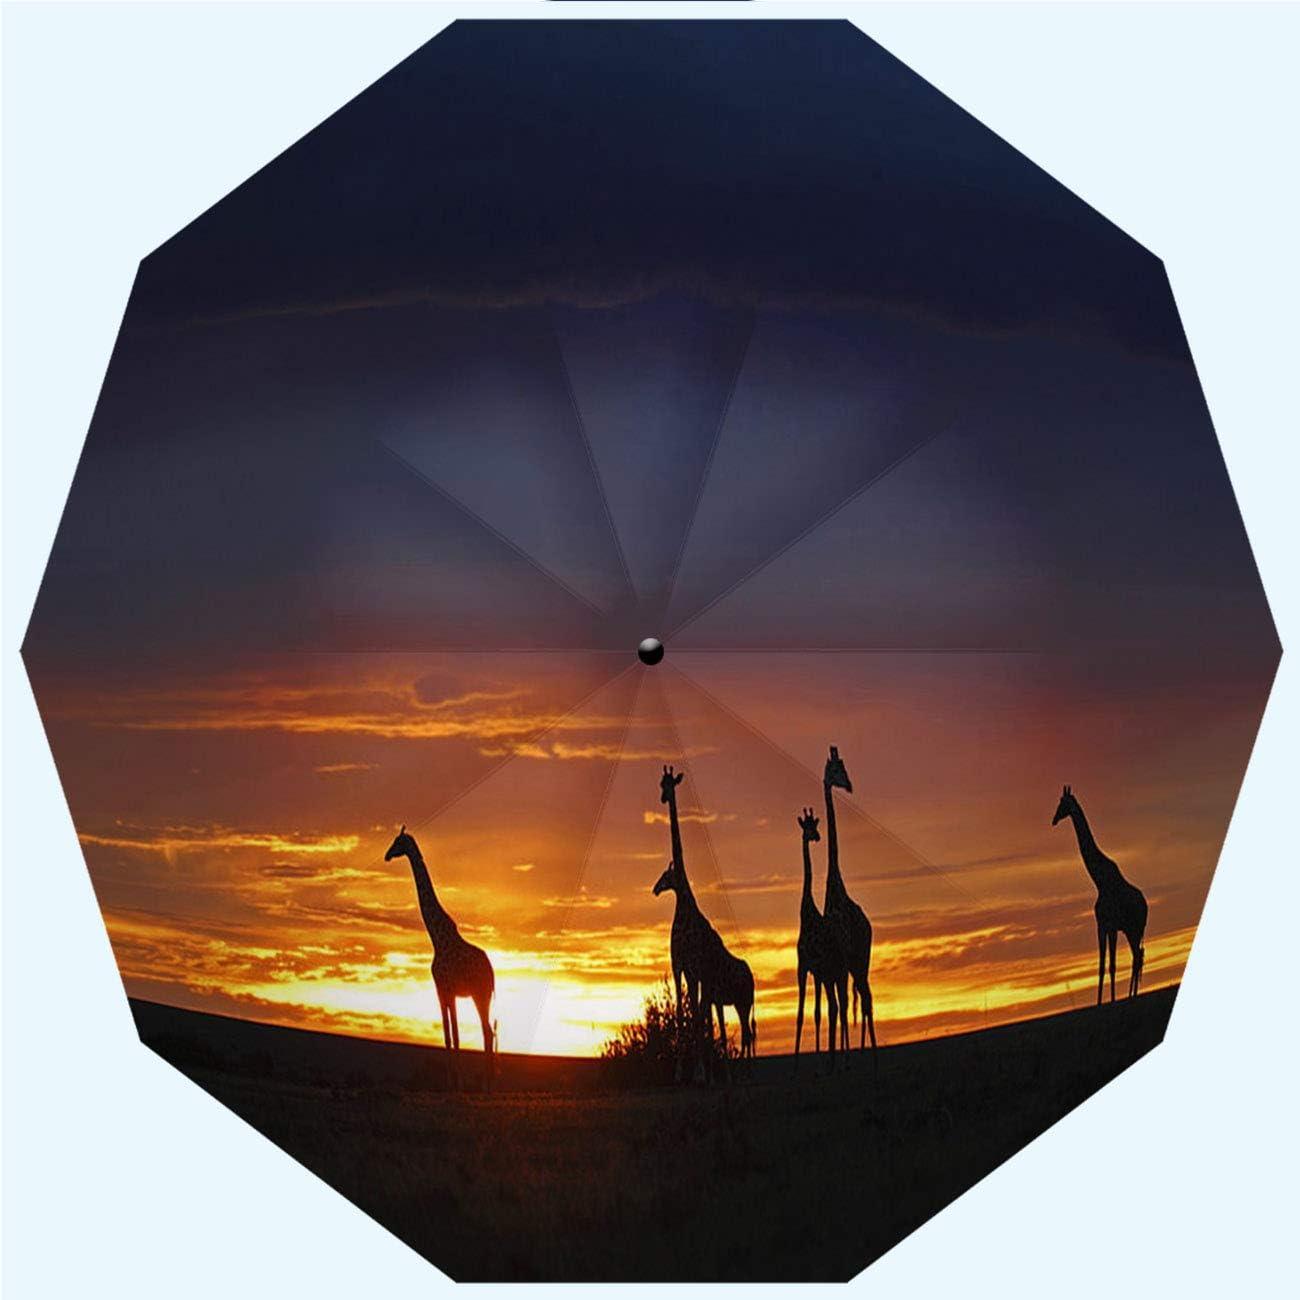 Men 42 Inches 10 Ribs Automatic Opening and Closing,Sunrise in The Jungle,Windproof Ladies RLDSESS Jungle Travel Folding Umbrella Rainproof